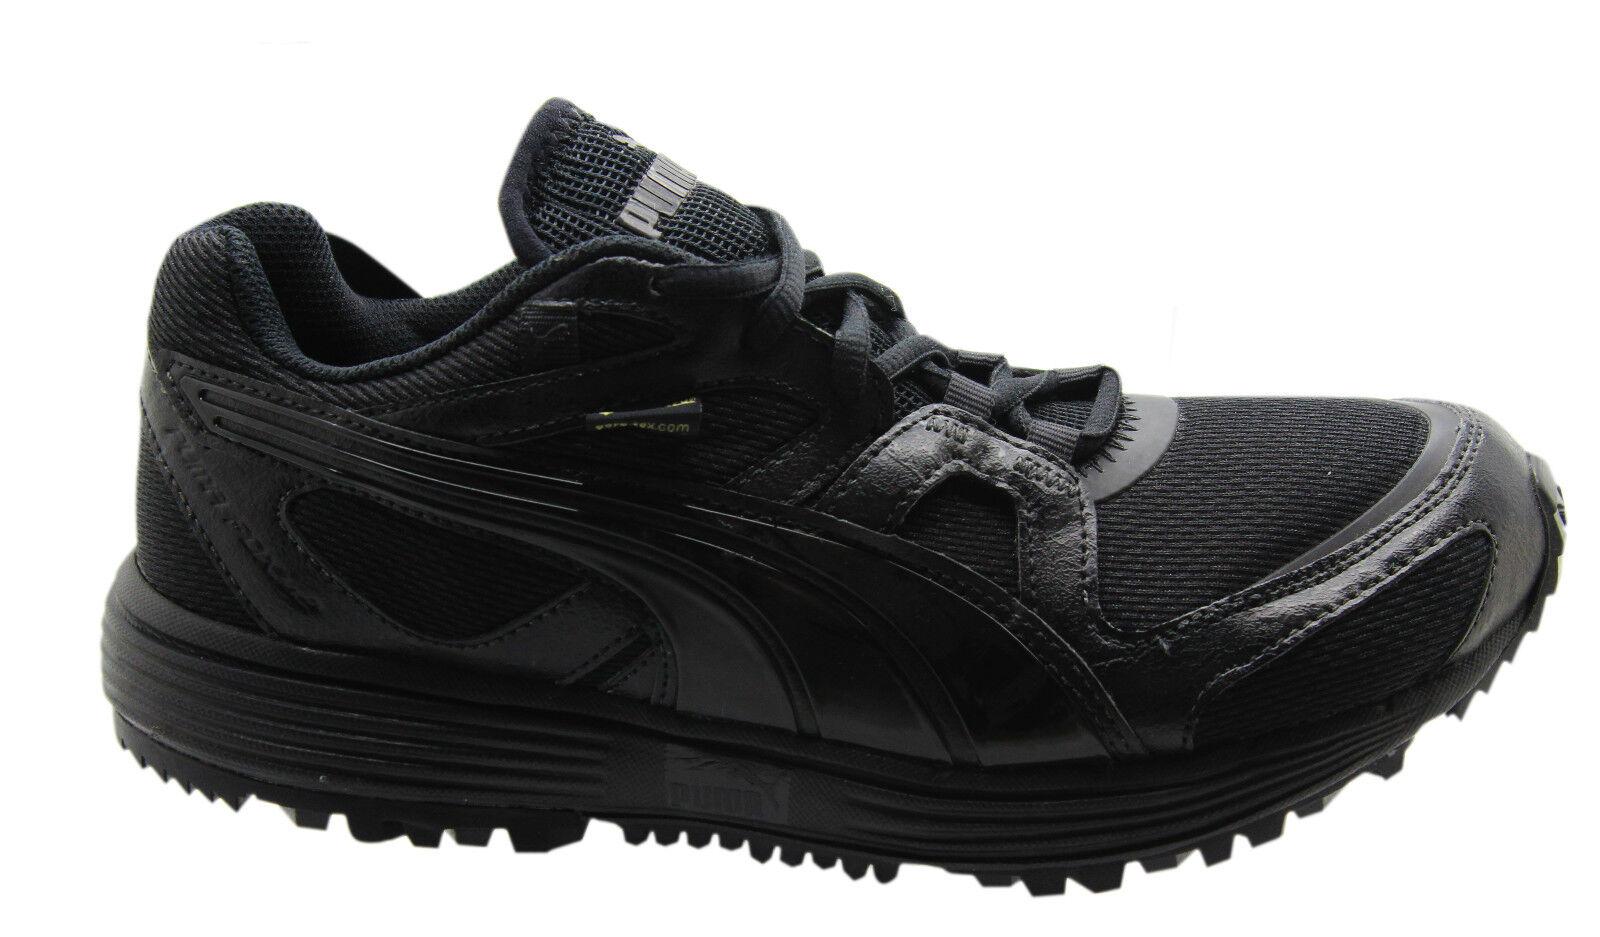 Puma Pumafox V2 Gortex Mens Mesh Lace Up Running shoes (186746 04 - U65)